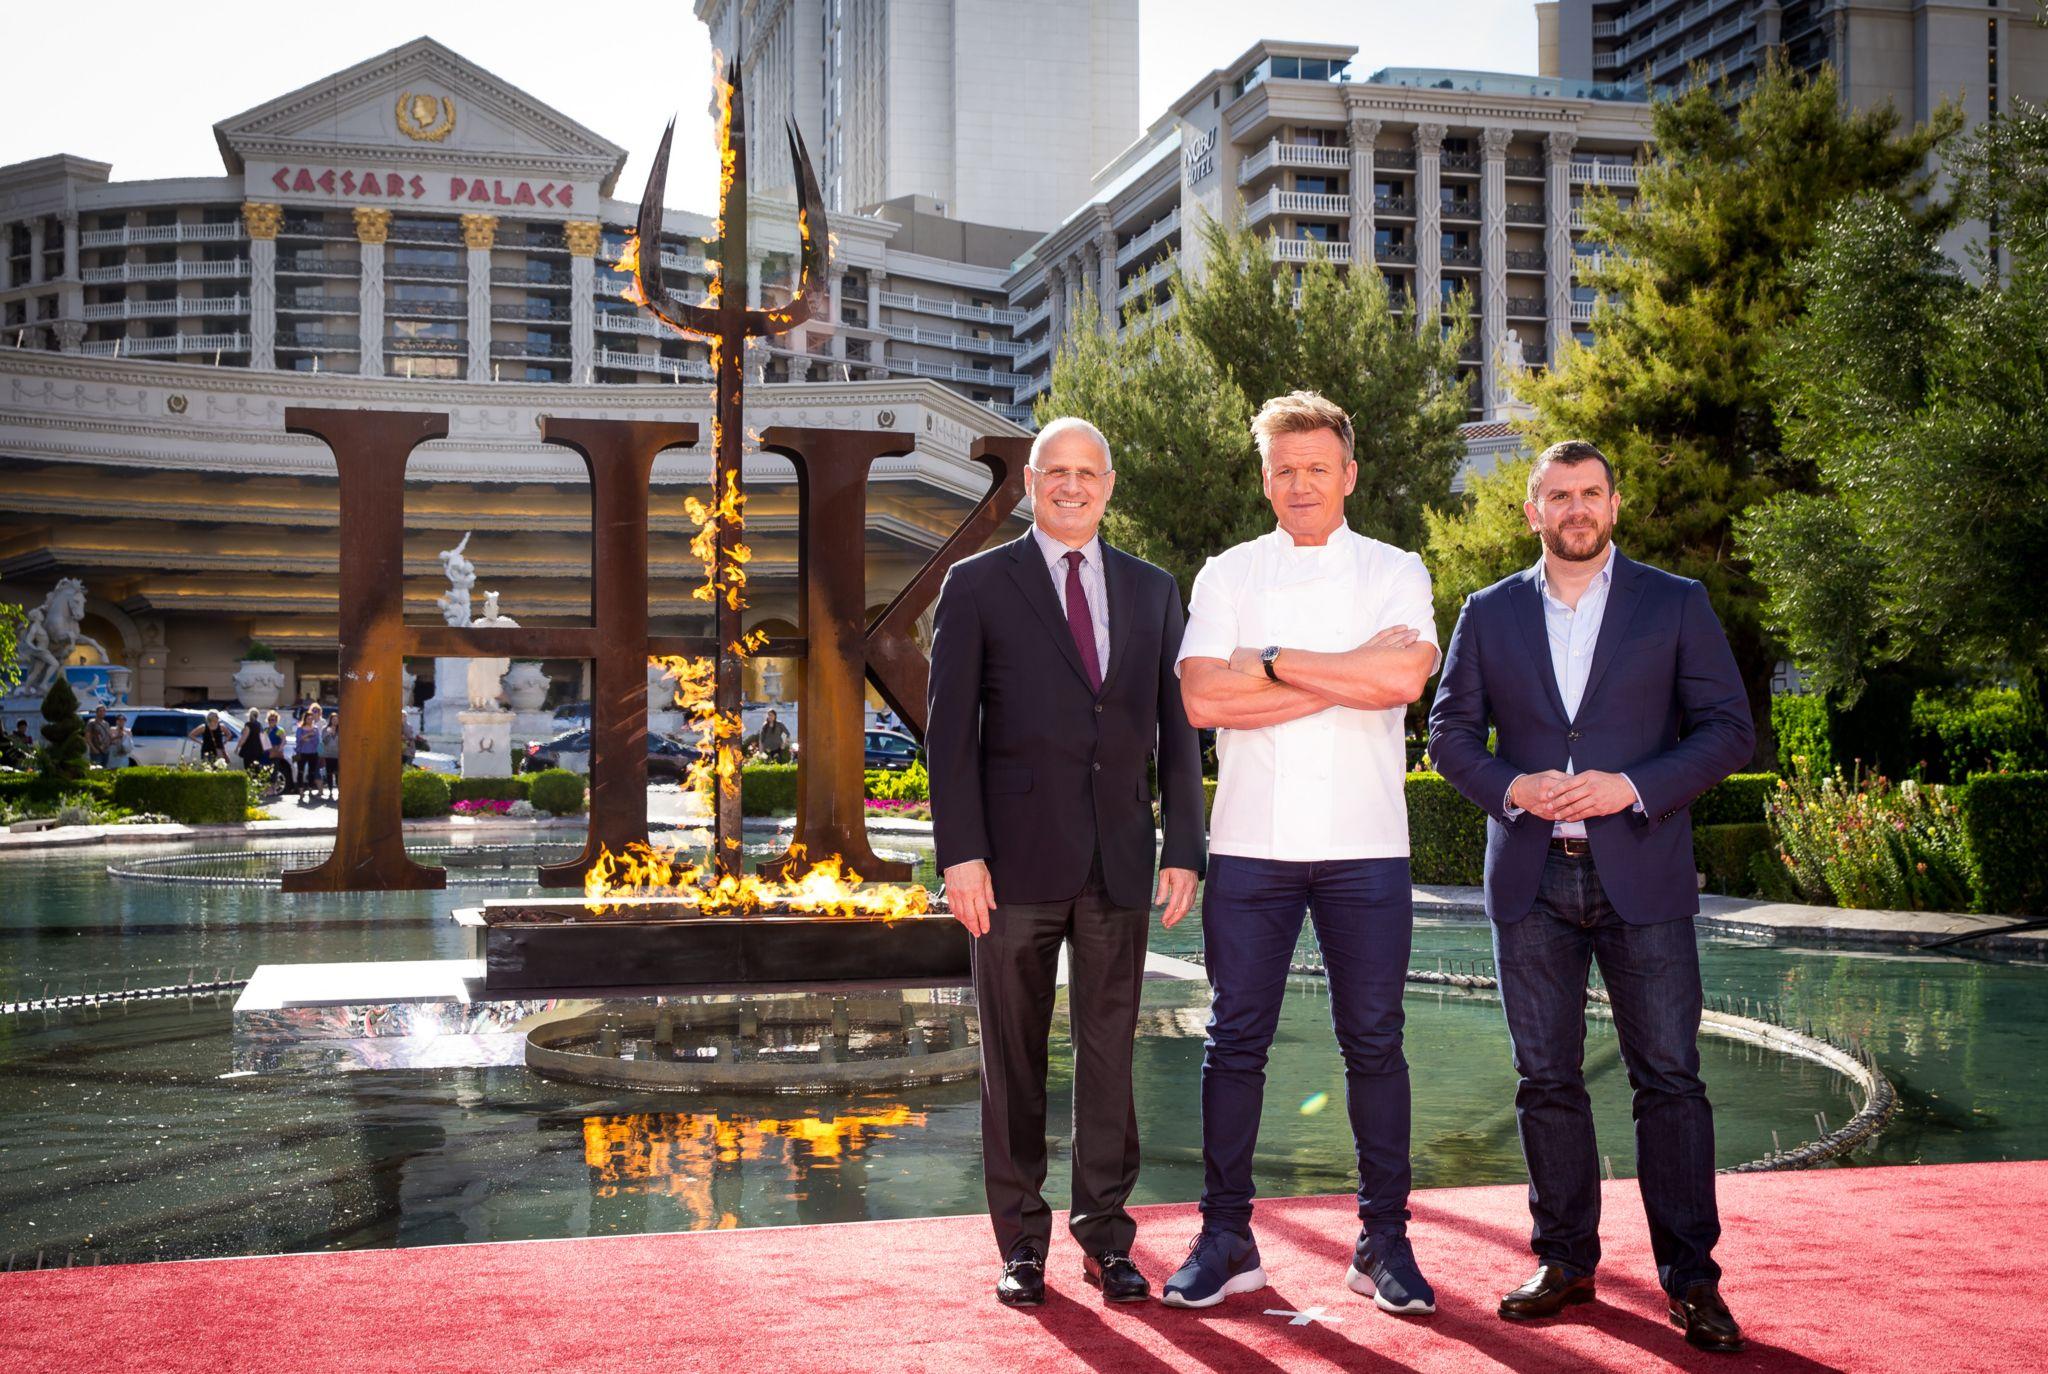 Gordon Ramsay outside Hell's Kitchen restaurant in Las Vegas